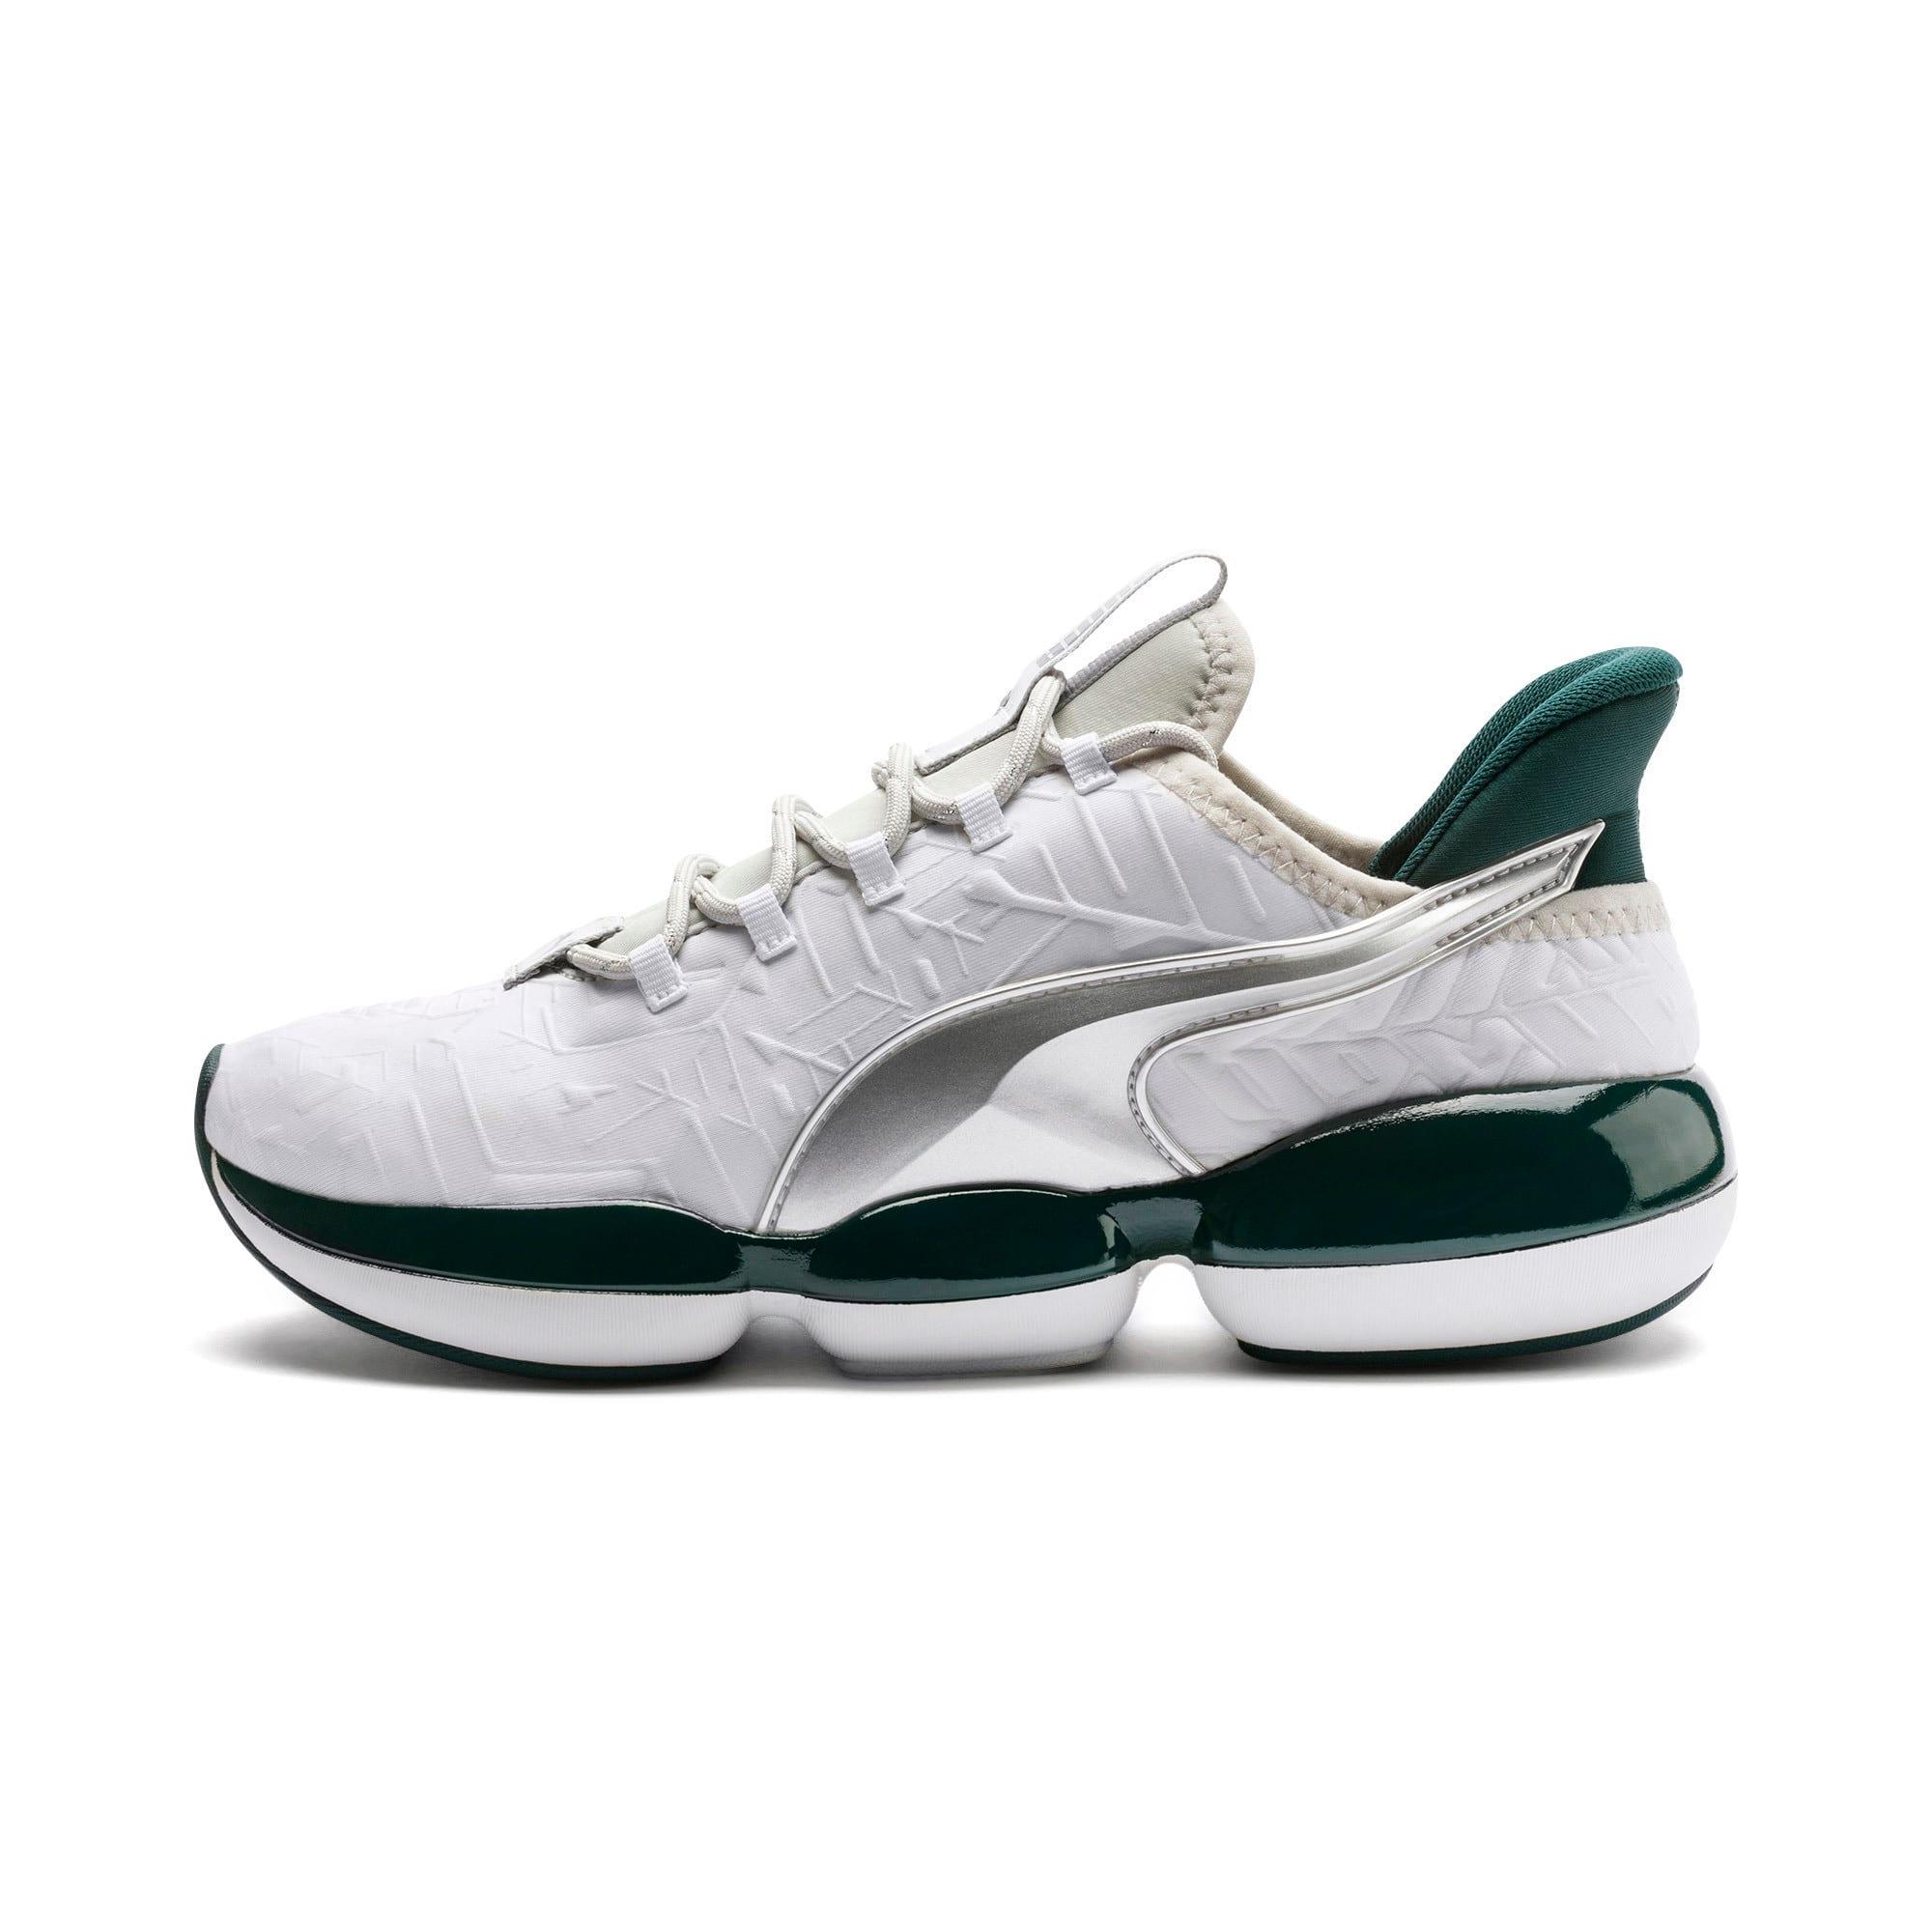 Miniatura 1 de Zapatos deentrenamiento Mode XT Trailblazer para mujer, Puma White-Ponderosa Pine, mediano